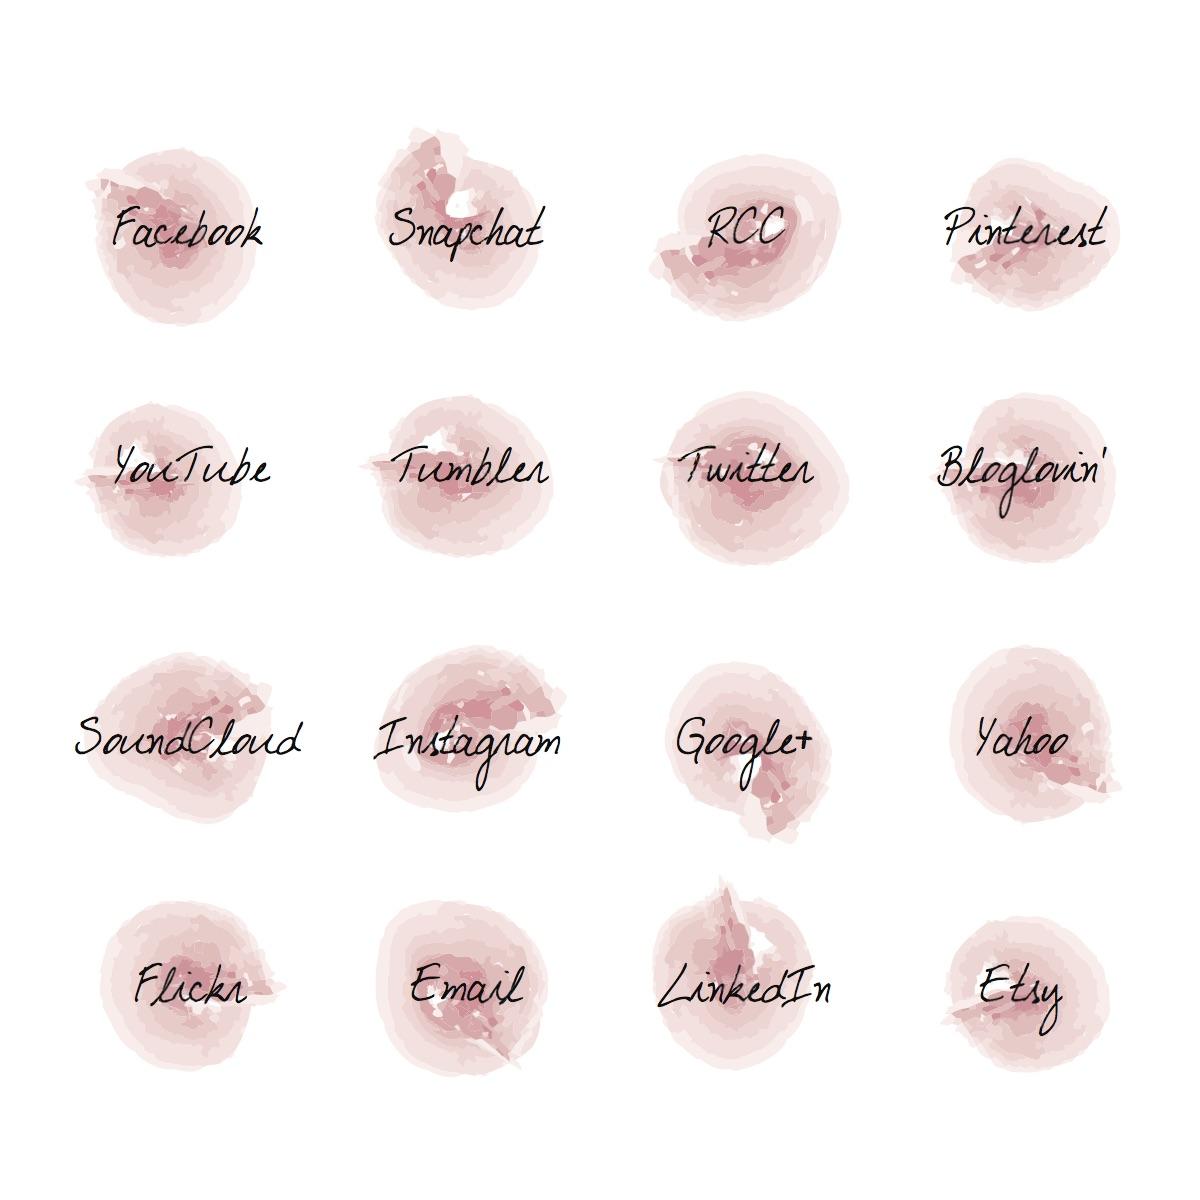 Bloguettes-SocialMediaIcons-PinkWaterCircles.jpg